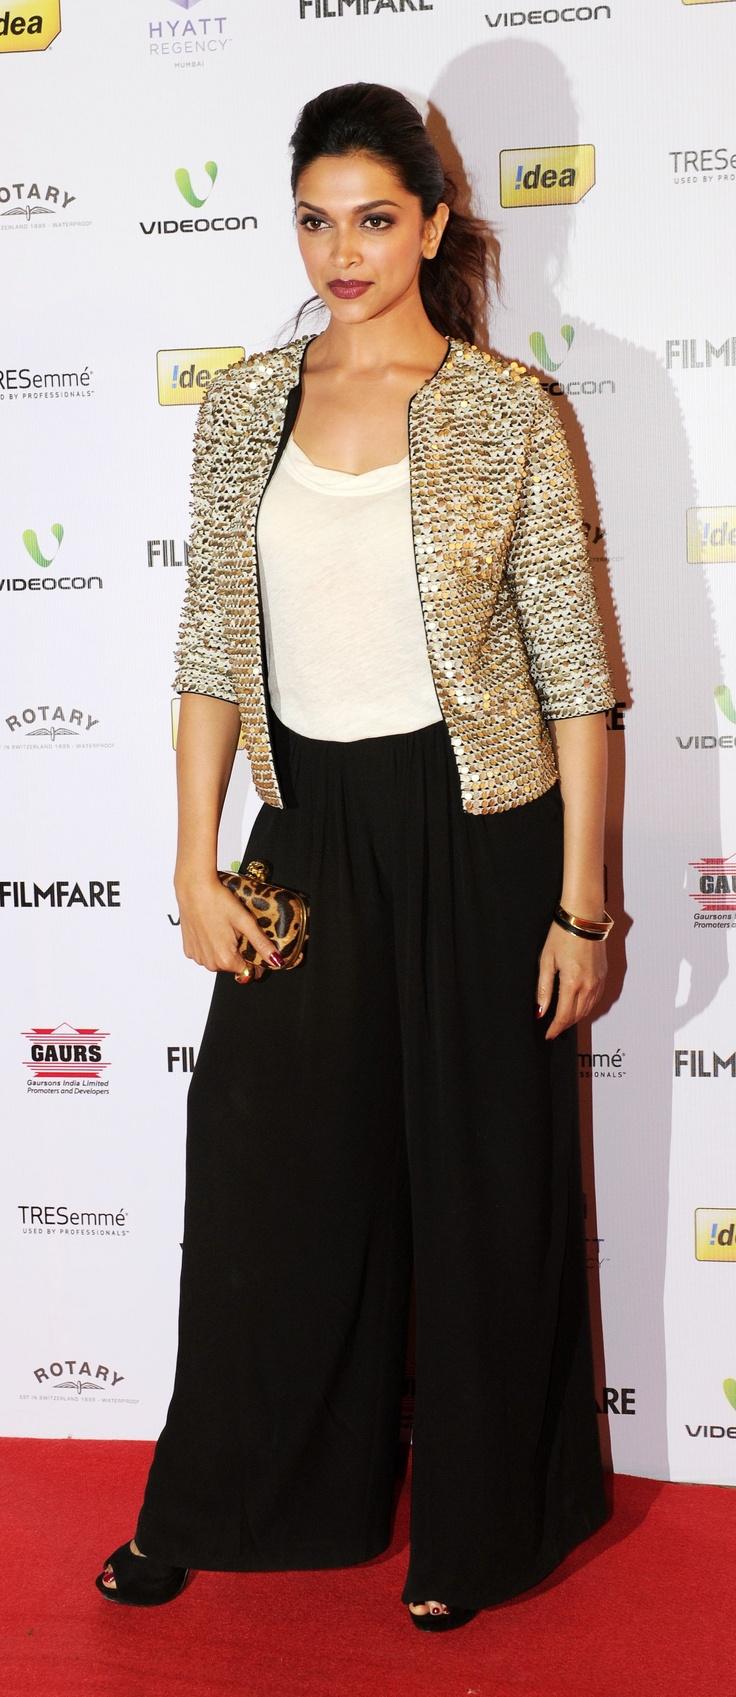 Deepika Padukone at the Filmfare nominations night 2013